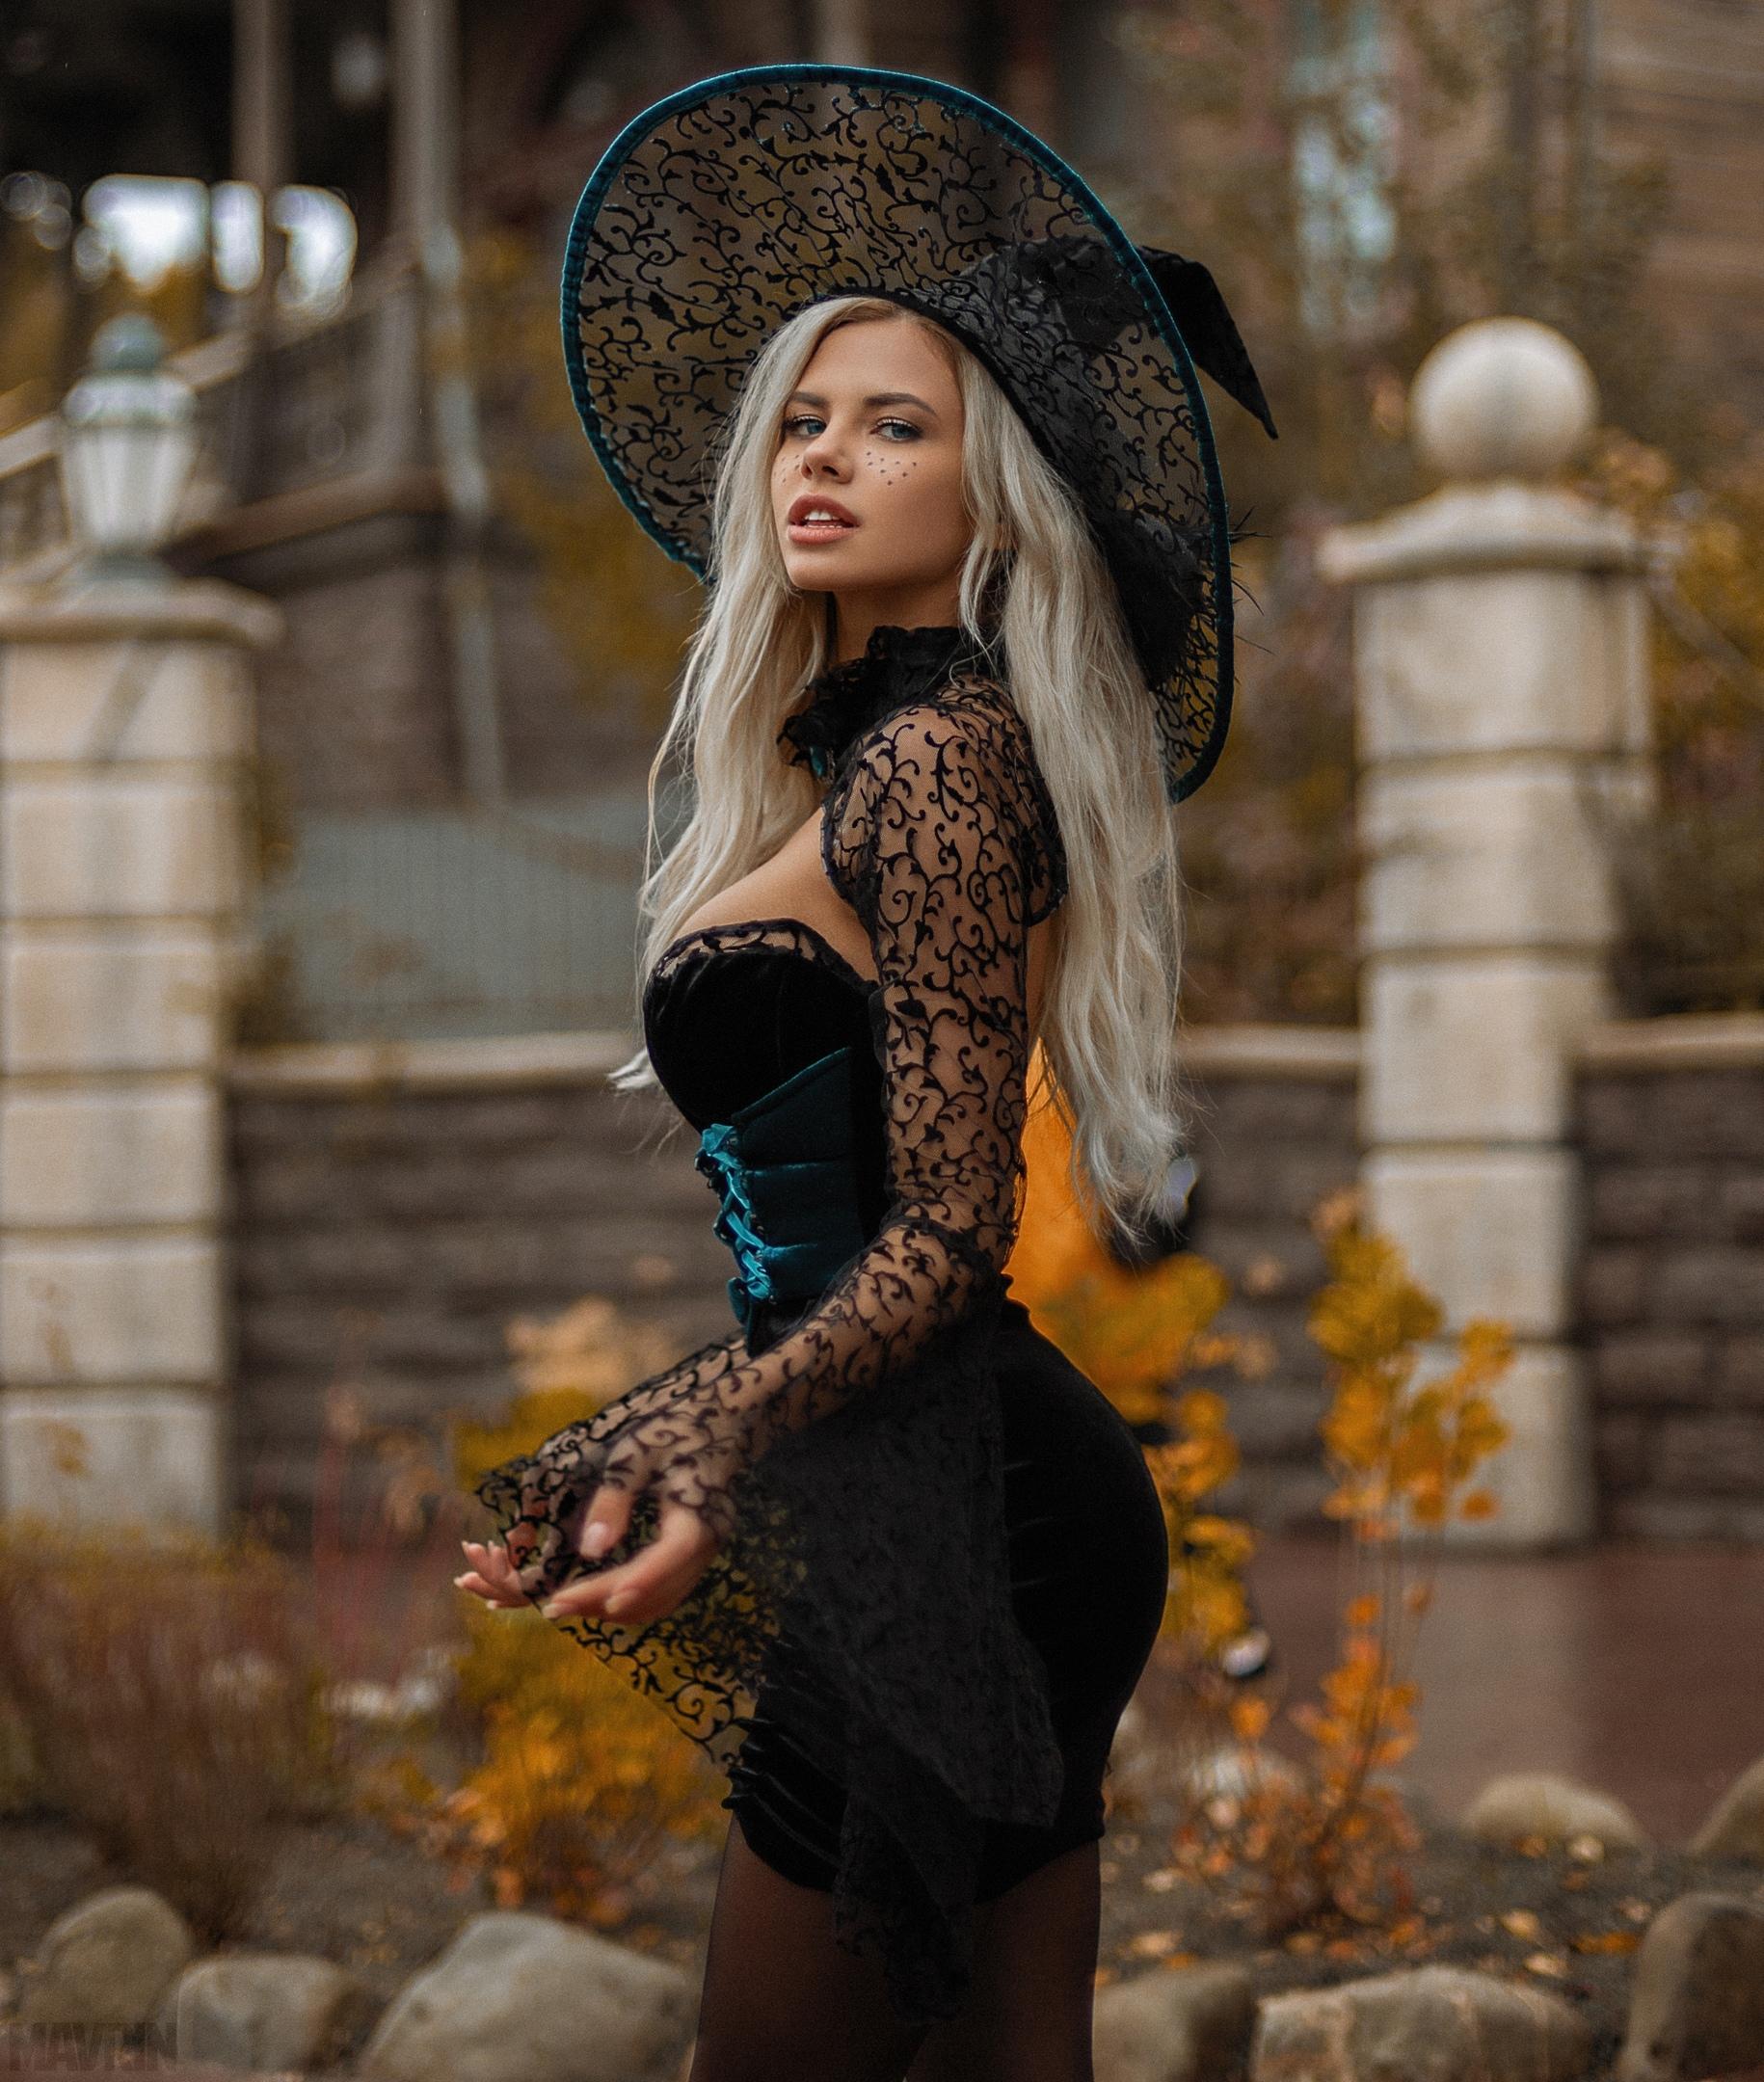 People 1830x2160 Nata Lee women outdoors Russian women model Aleksandr Mavrin women portrait display blonde dress hat standing looking at viewer black dress curvy tight dress black clothing pantyhose